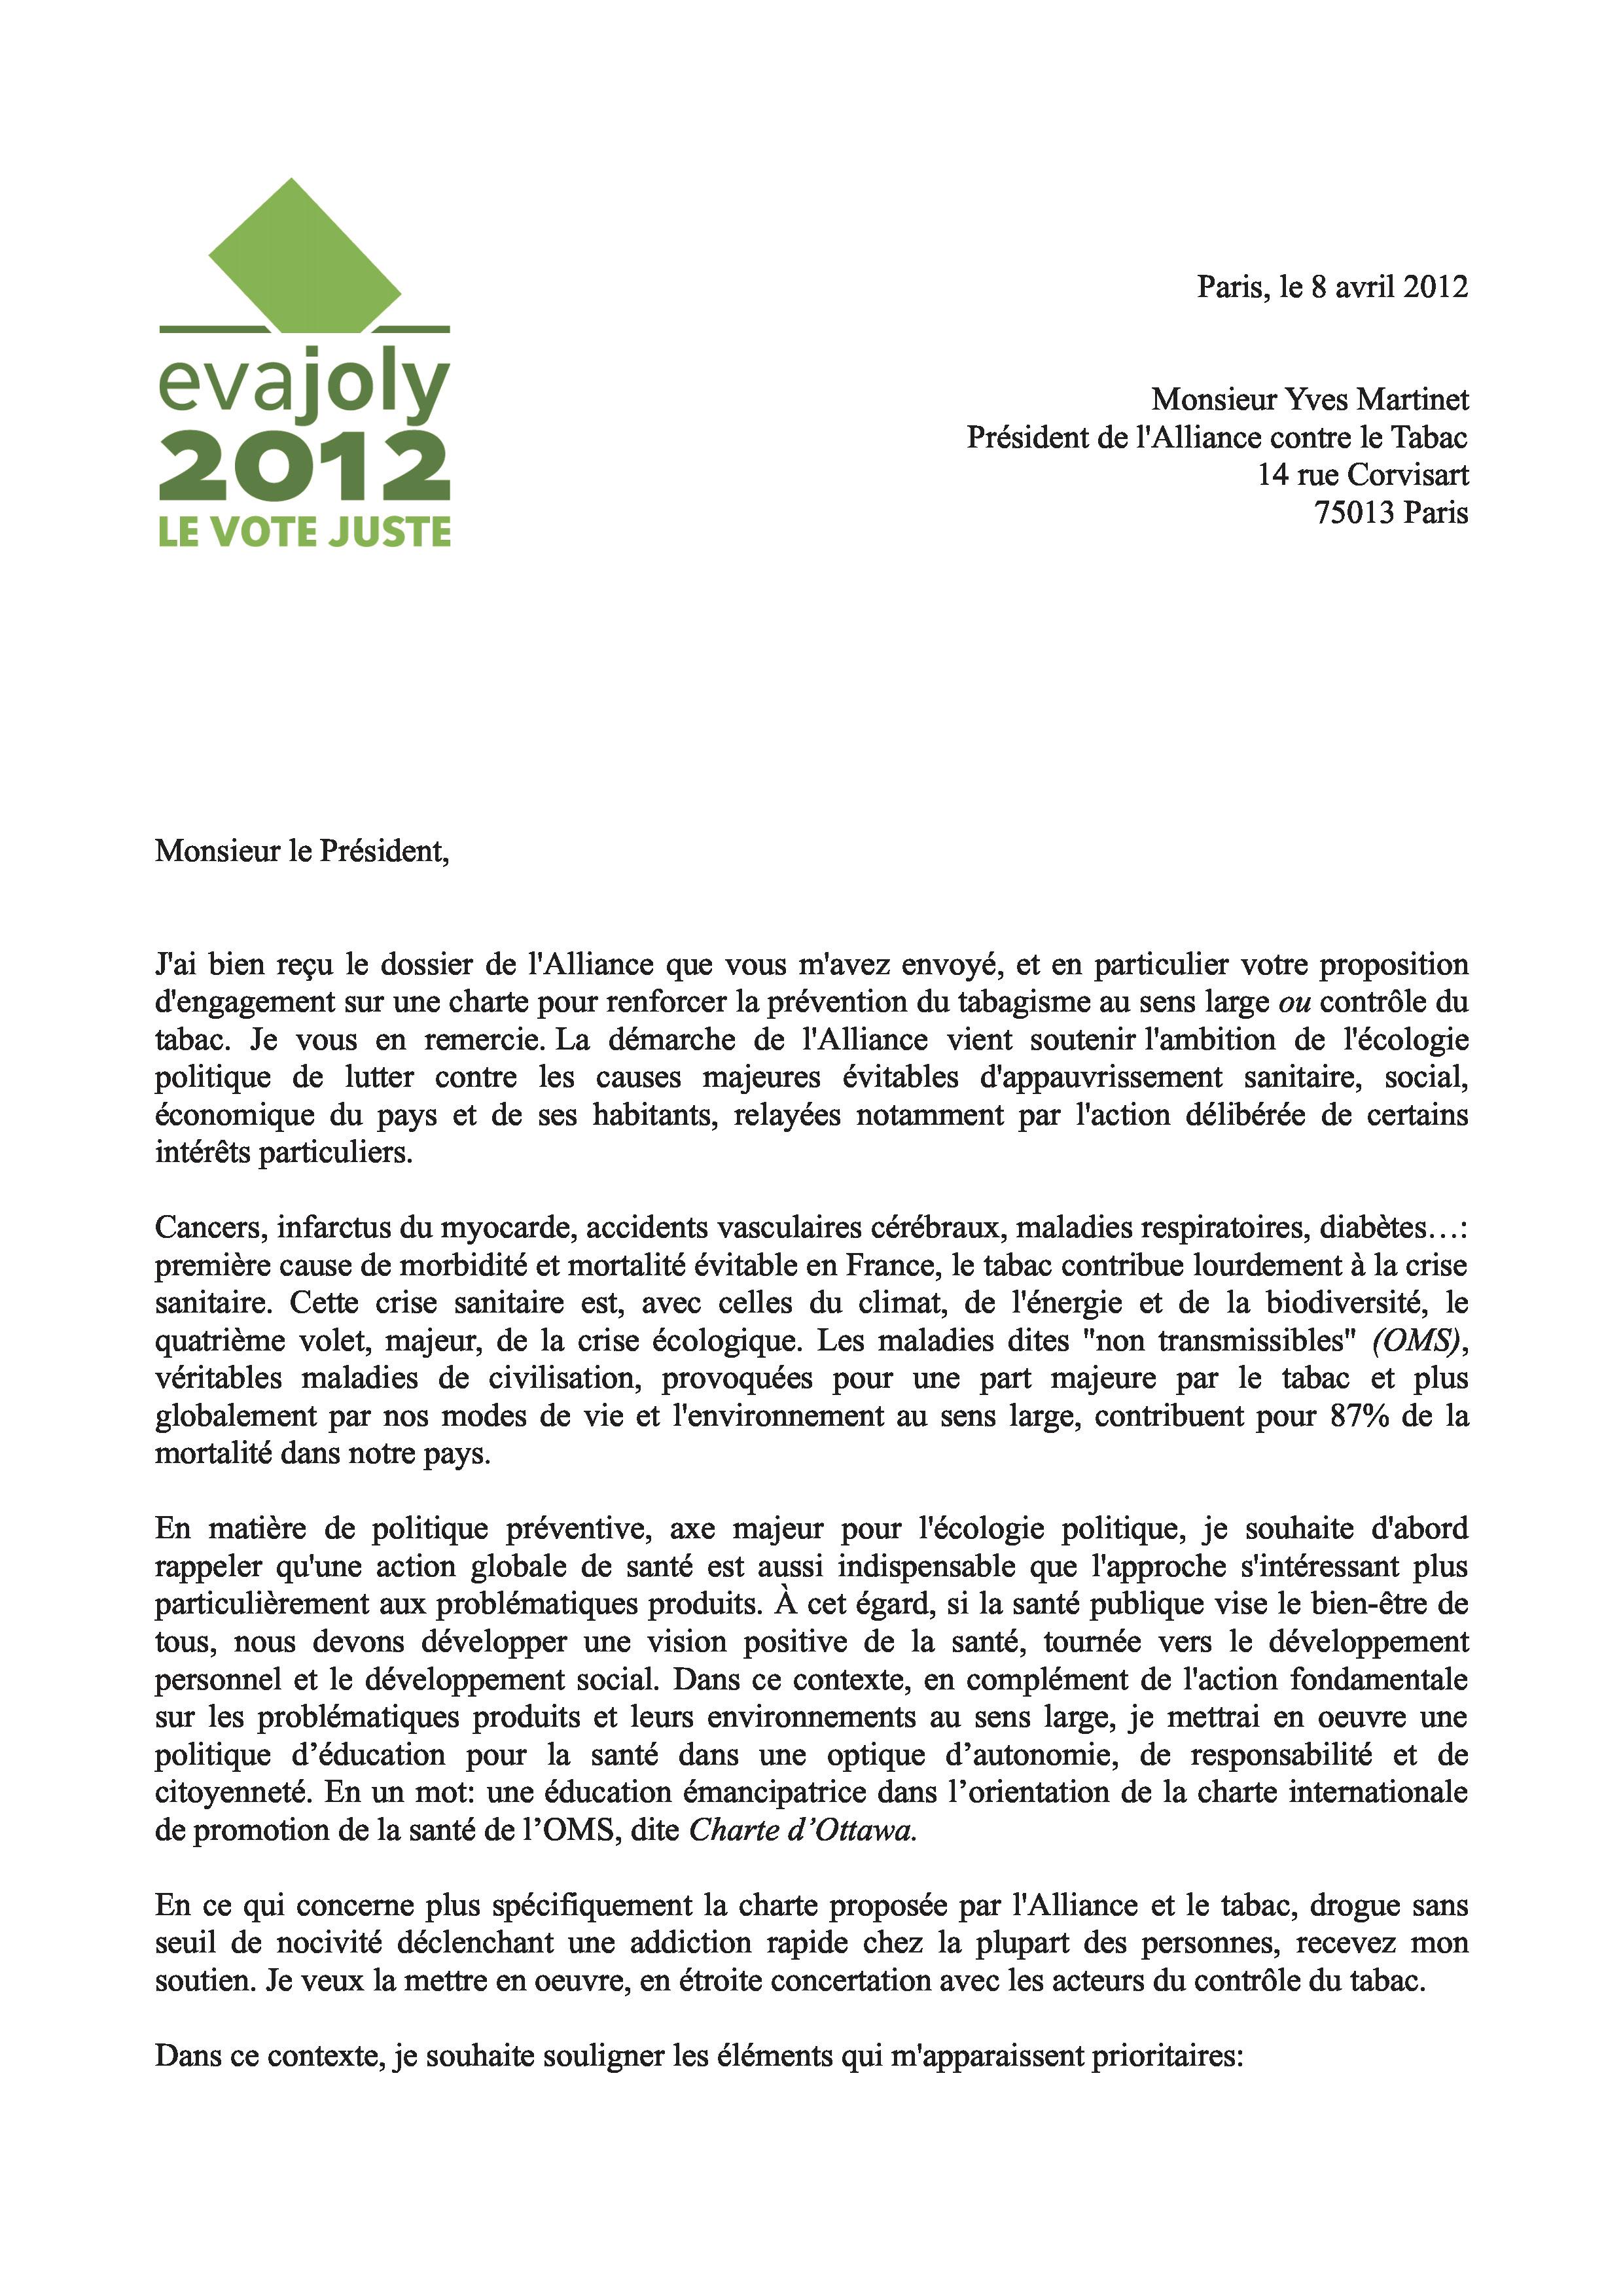 Alliance-dossier-presse-livre-blanc-11avr2012_Page_14.jpg